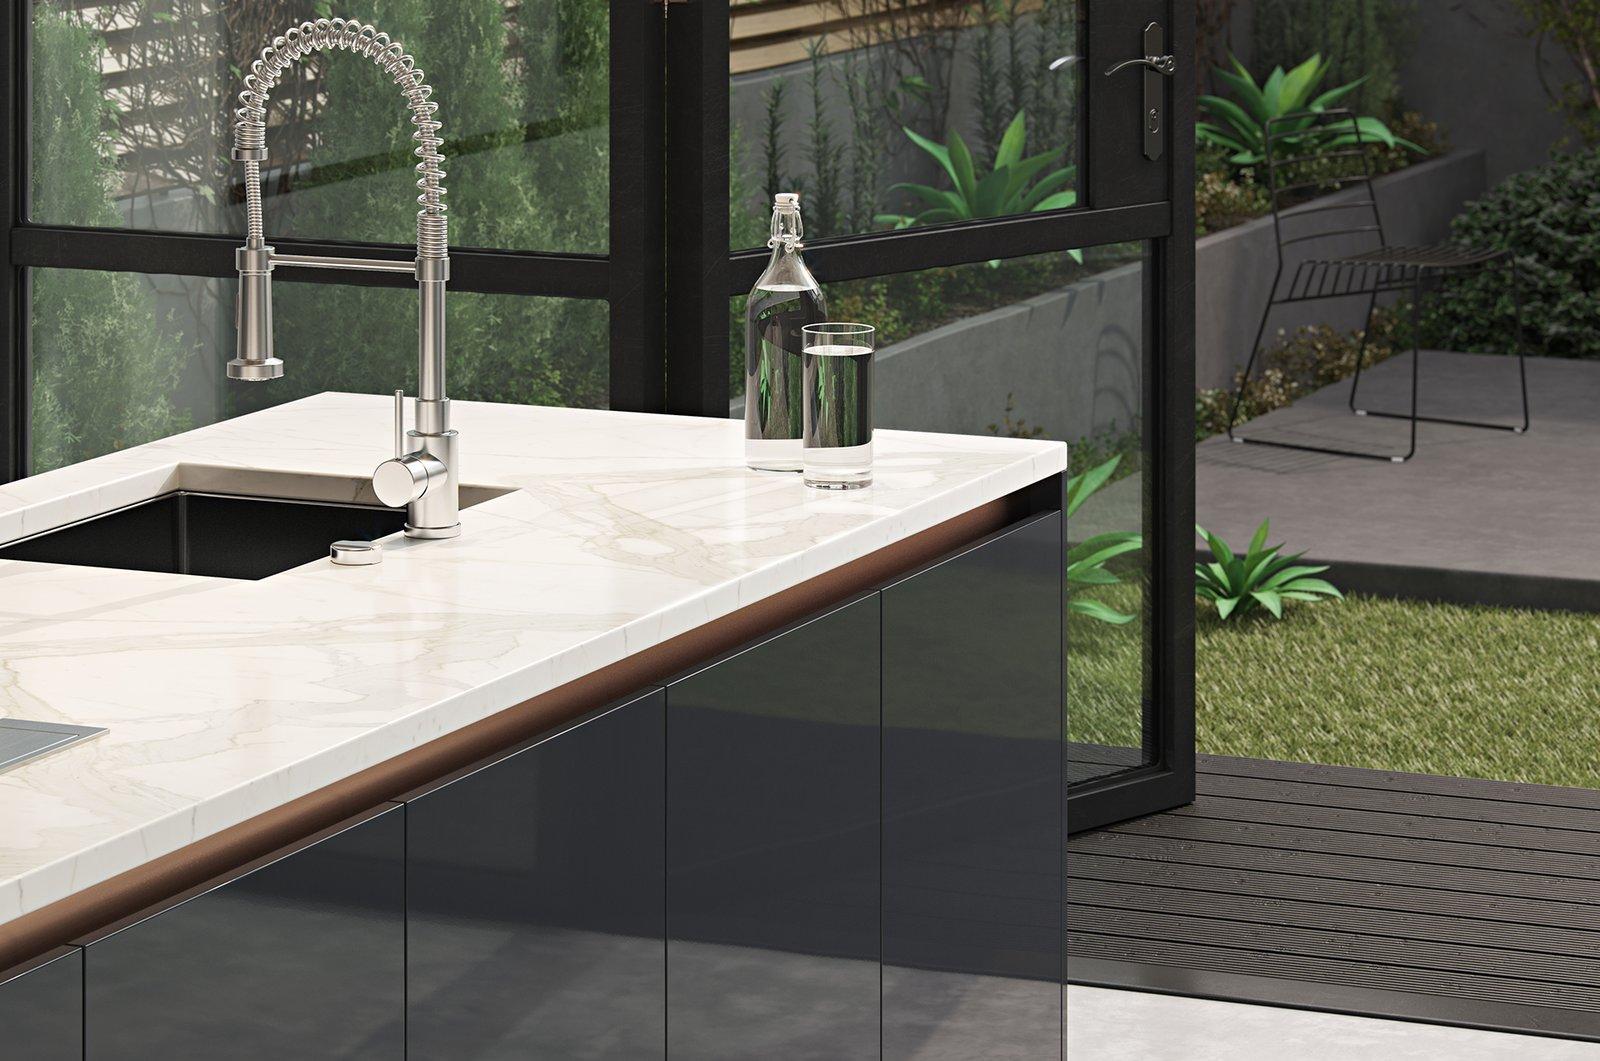 Kitchen, Marble Counter, Undermount Sink, Laminate Cabinet, and Concrete Floor  Kitchen//Extension by Mitaka DImov